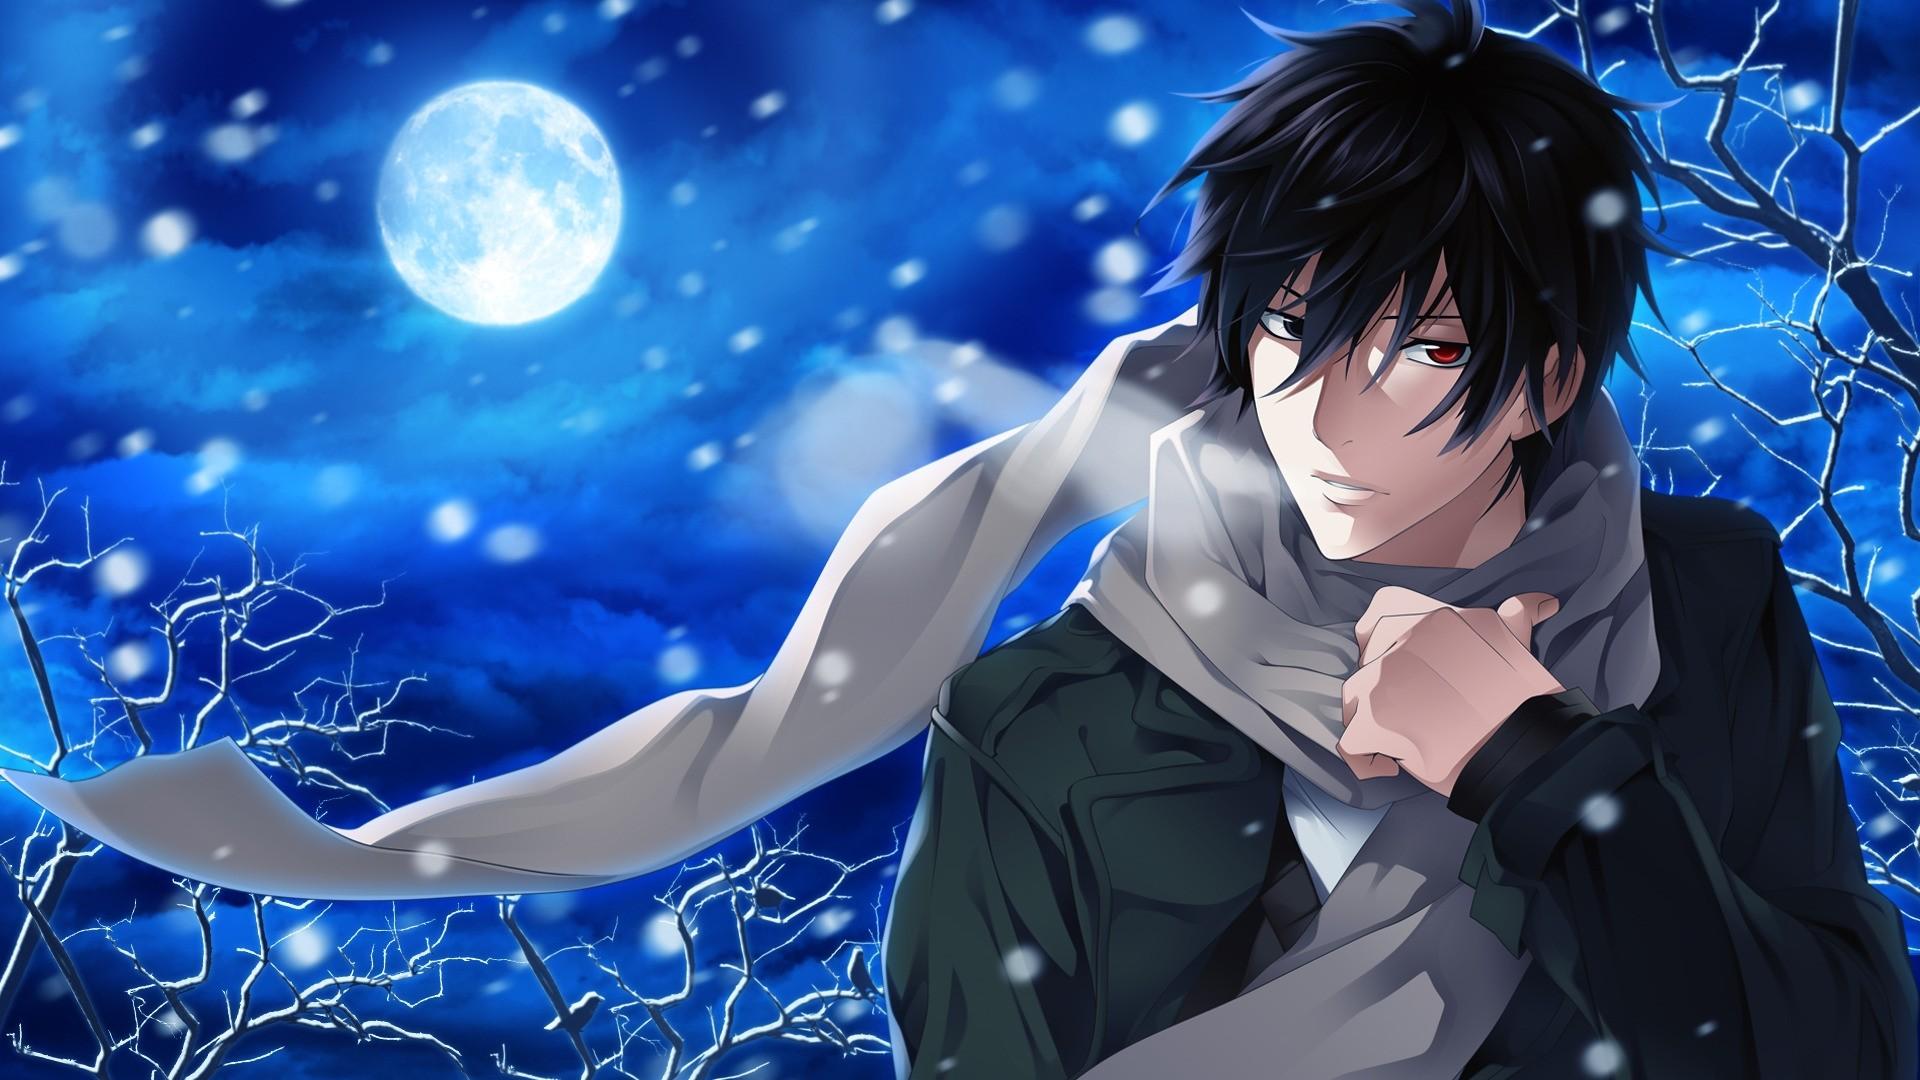 Handsome Anime Boy Desktop Wallpaper